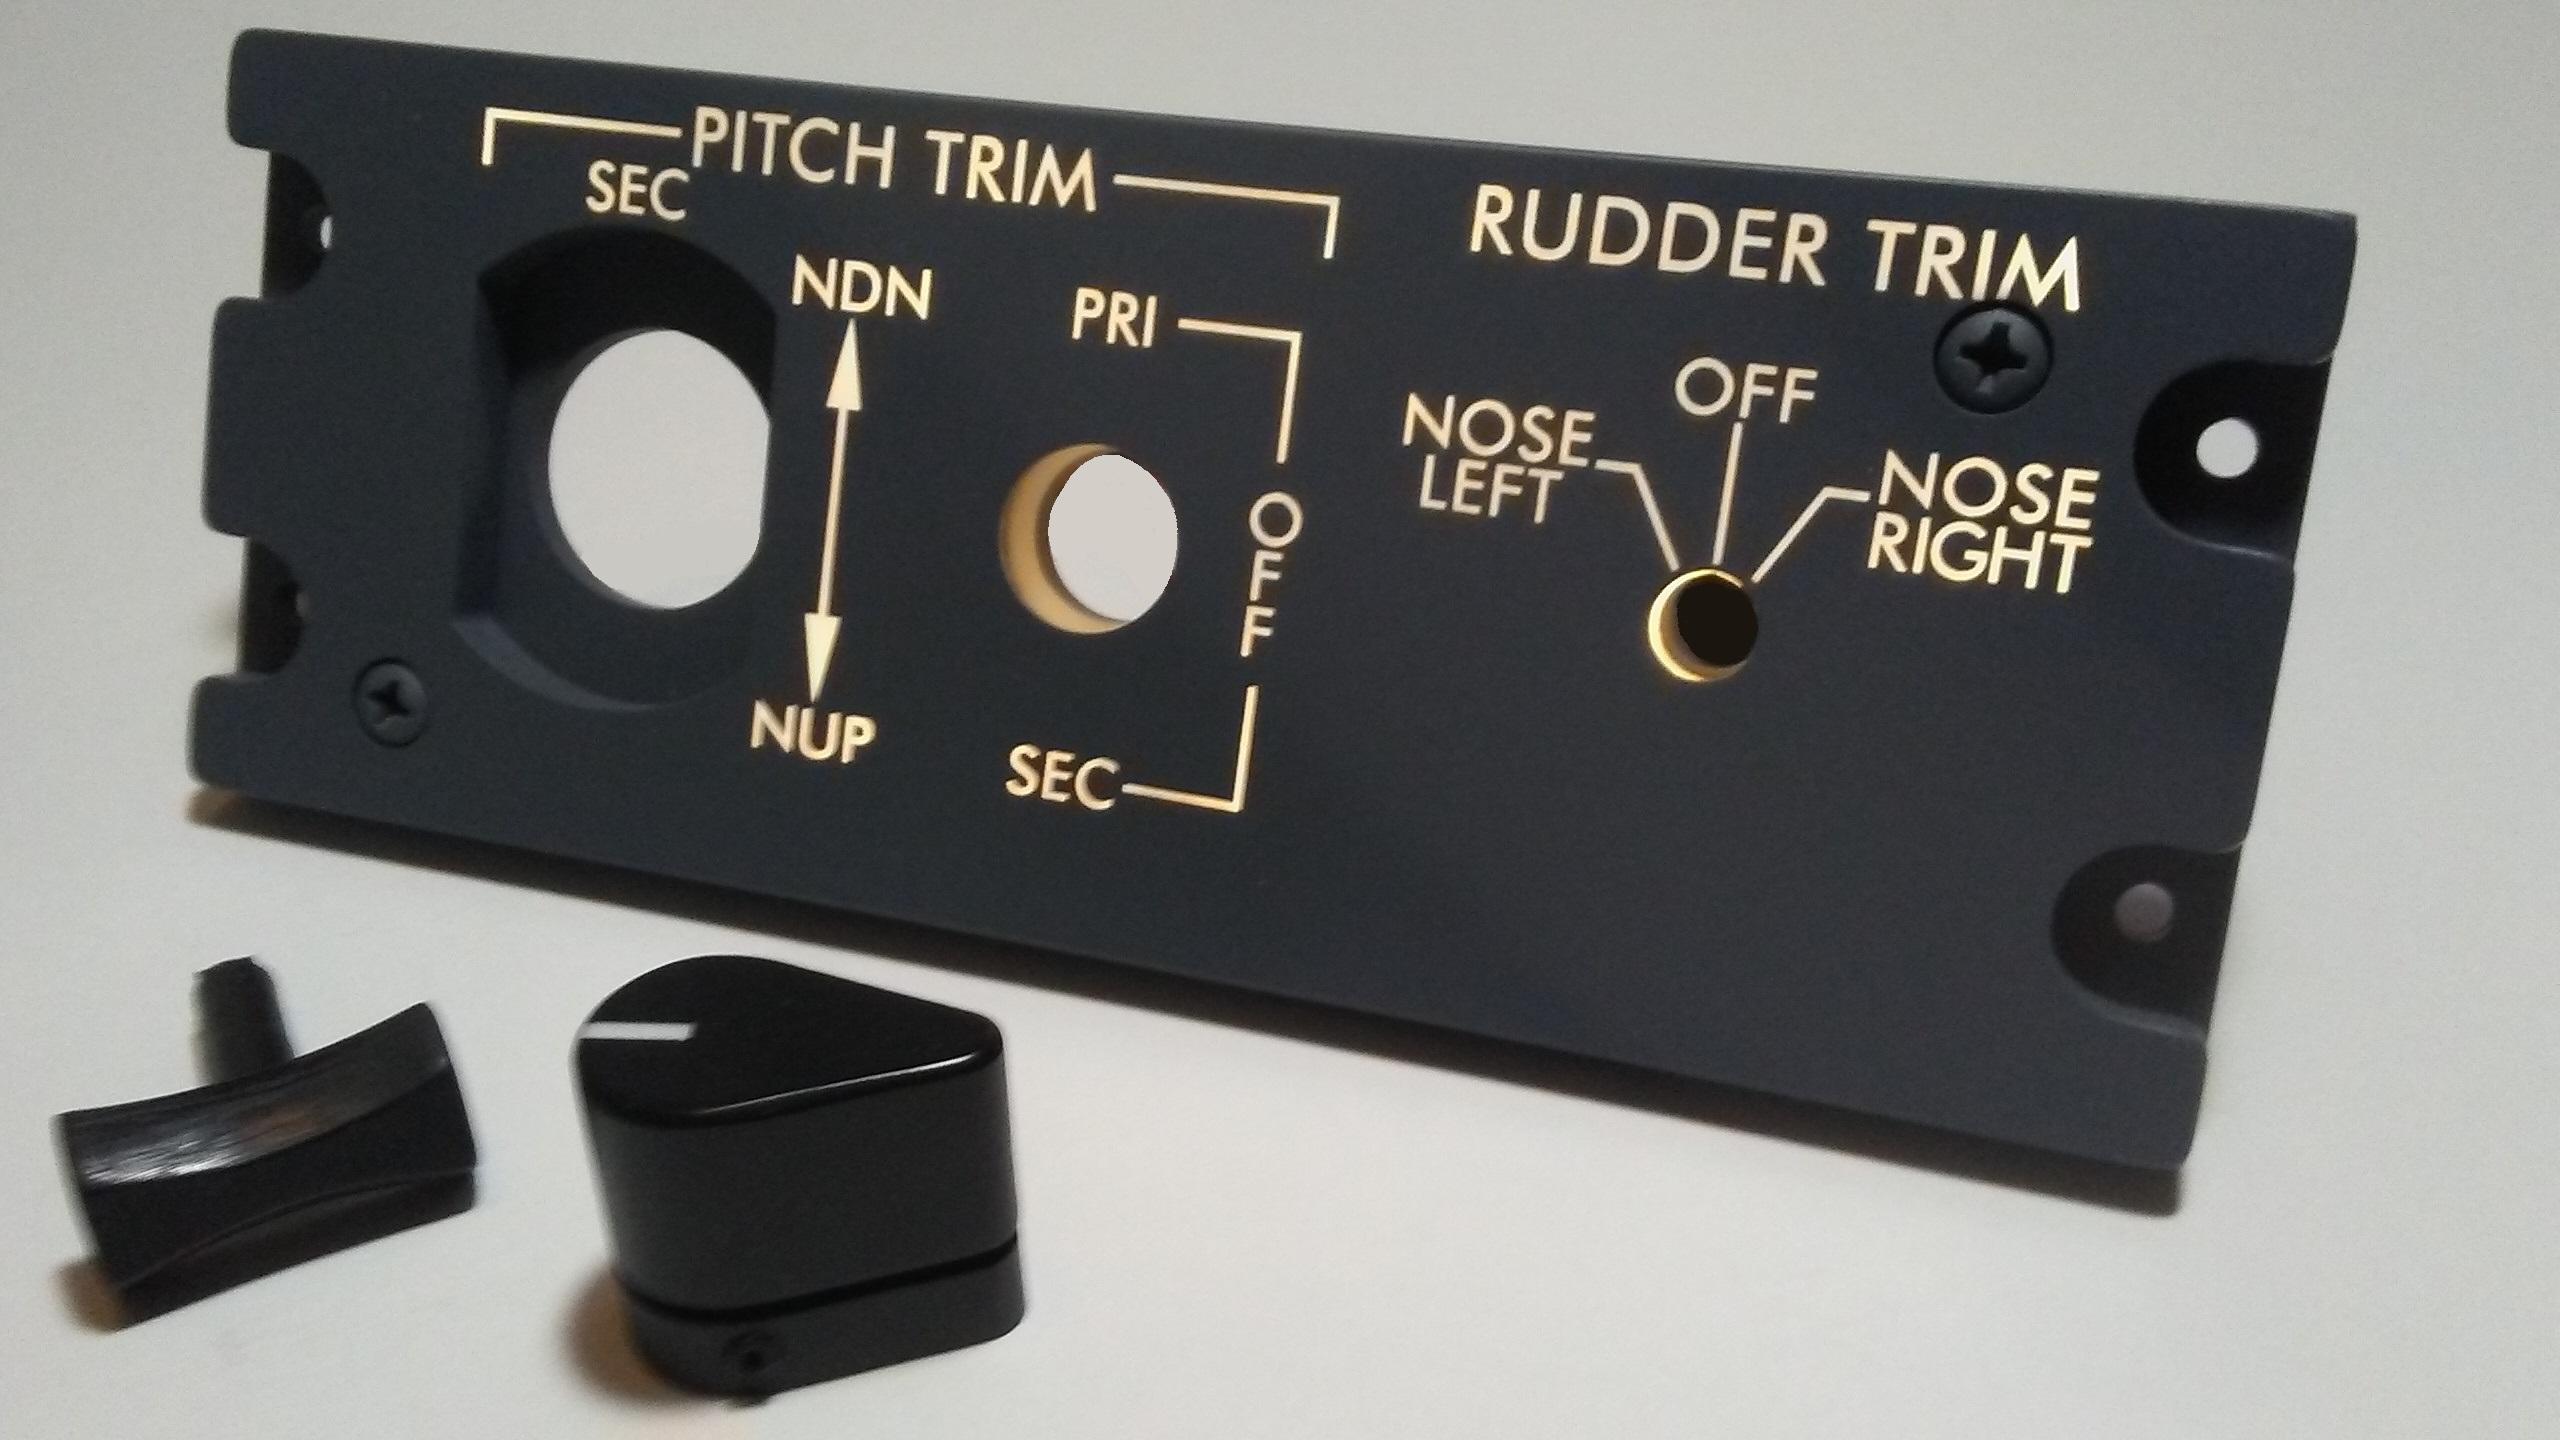 Pitch Trim Panel